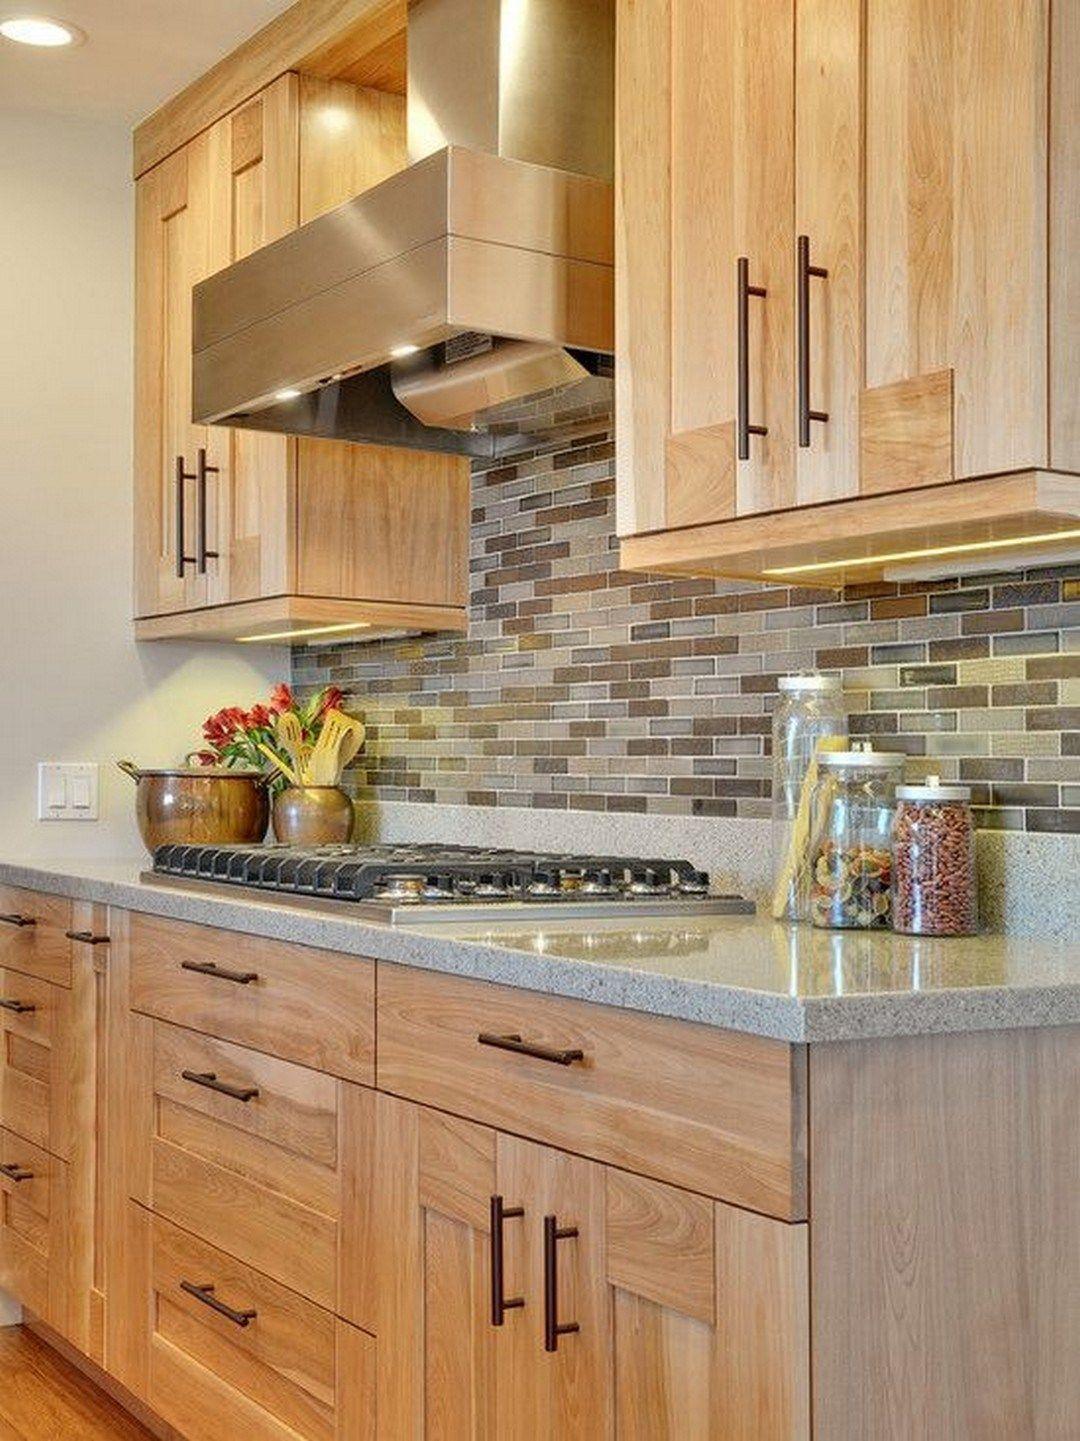 29 Fantastic Kitchen Backsplash Ideas With Oak